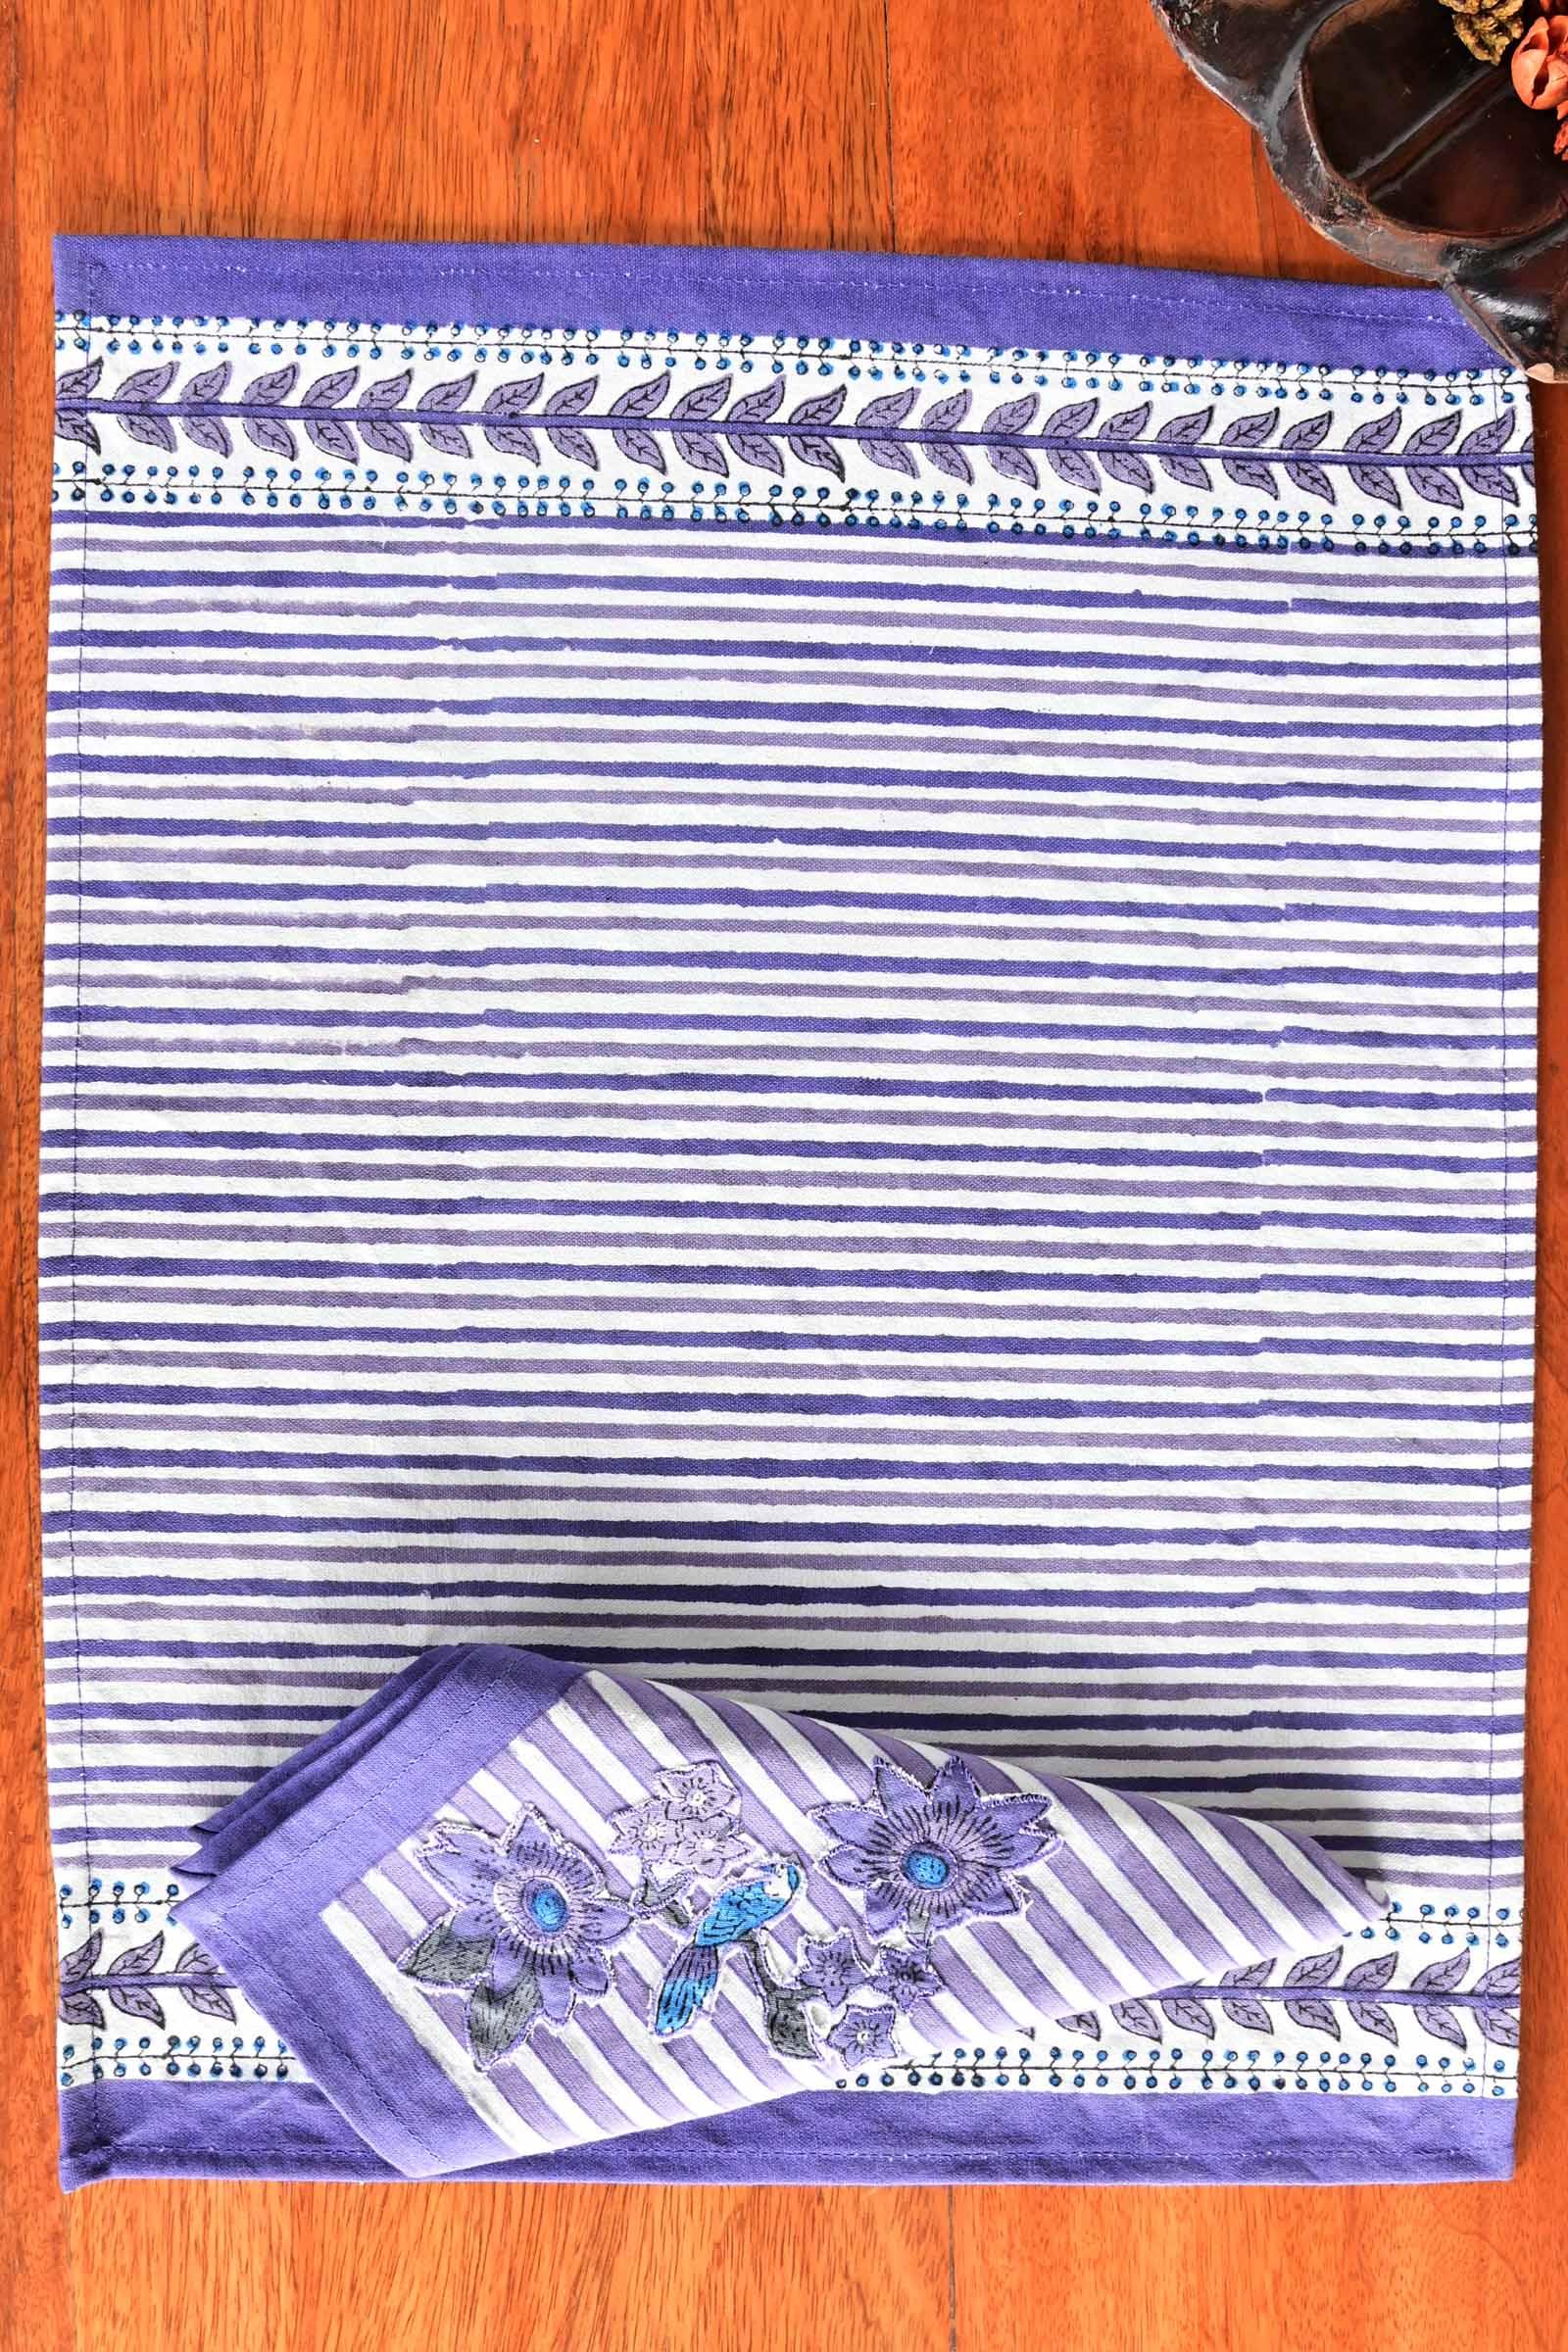 Artistic Lavender Mat